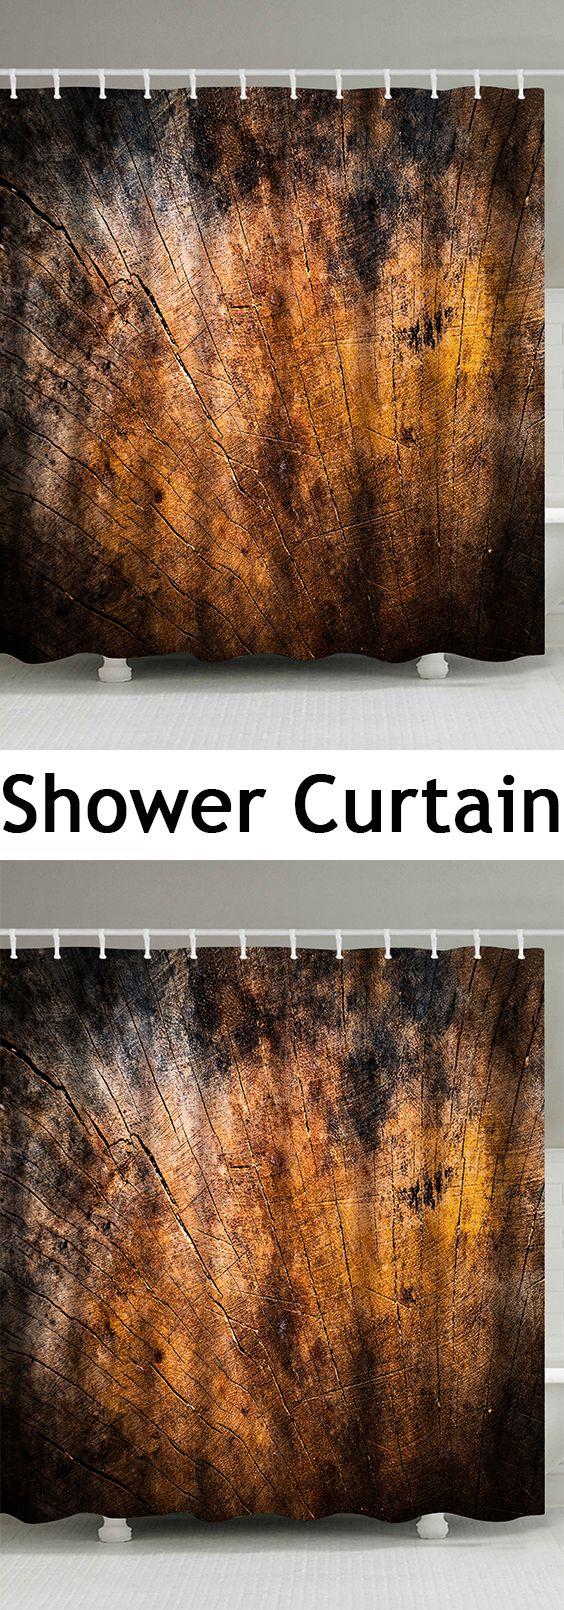 broken wood fabric extra long shower curtain | home decor online